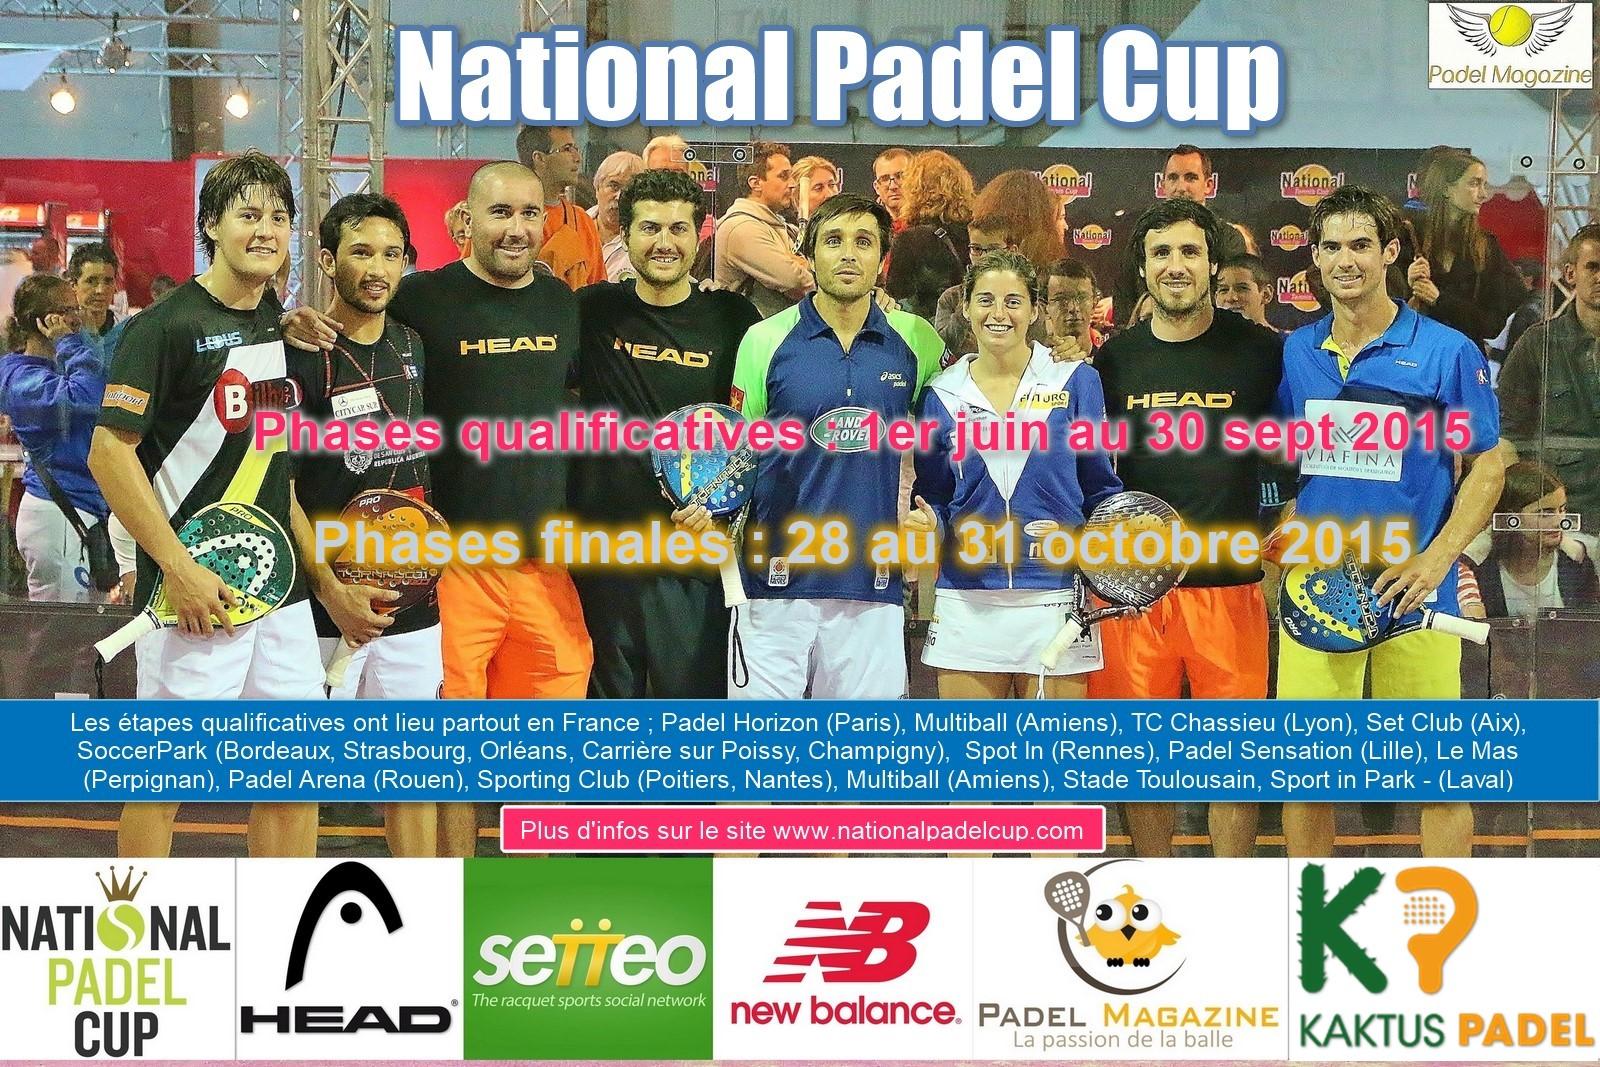 La National Padel Cup : OU et QUAND